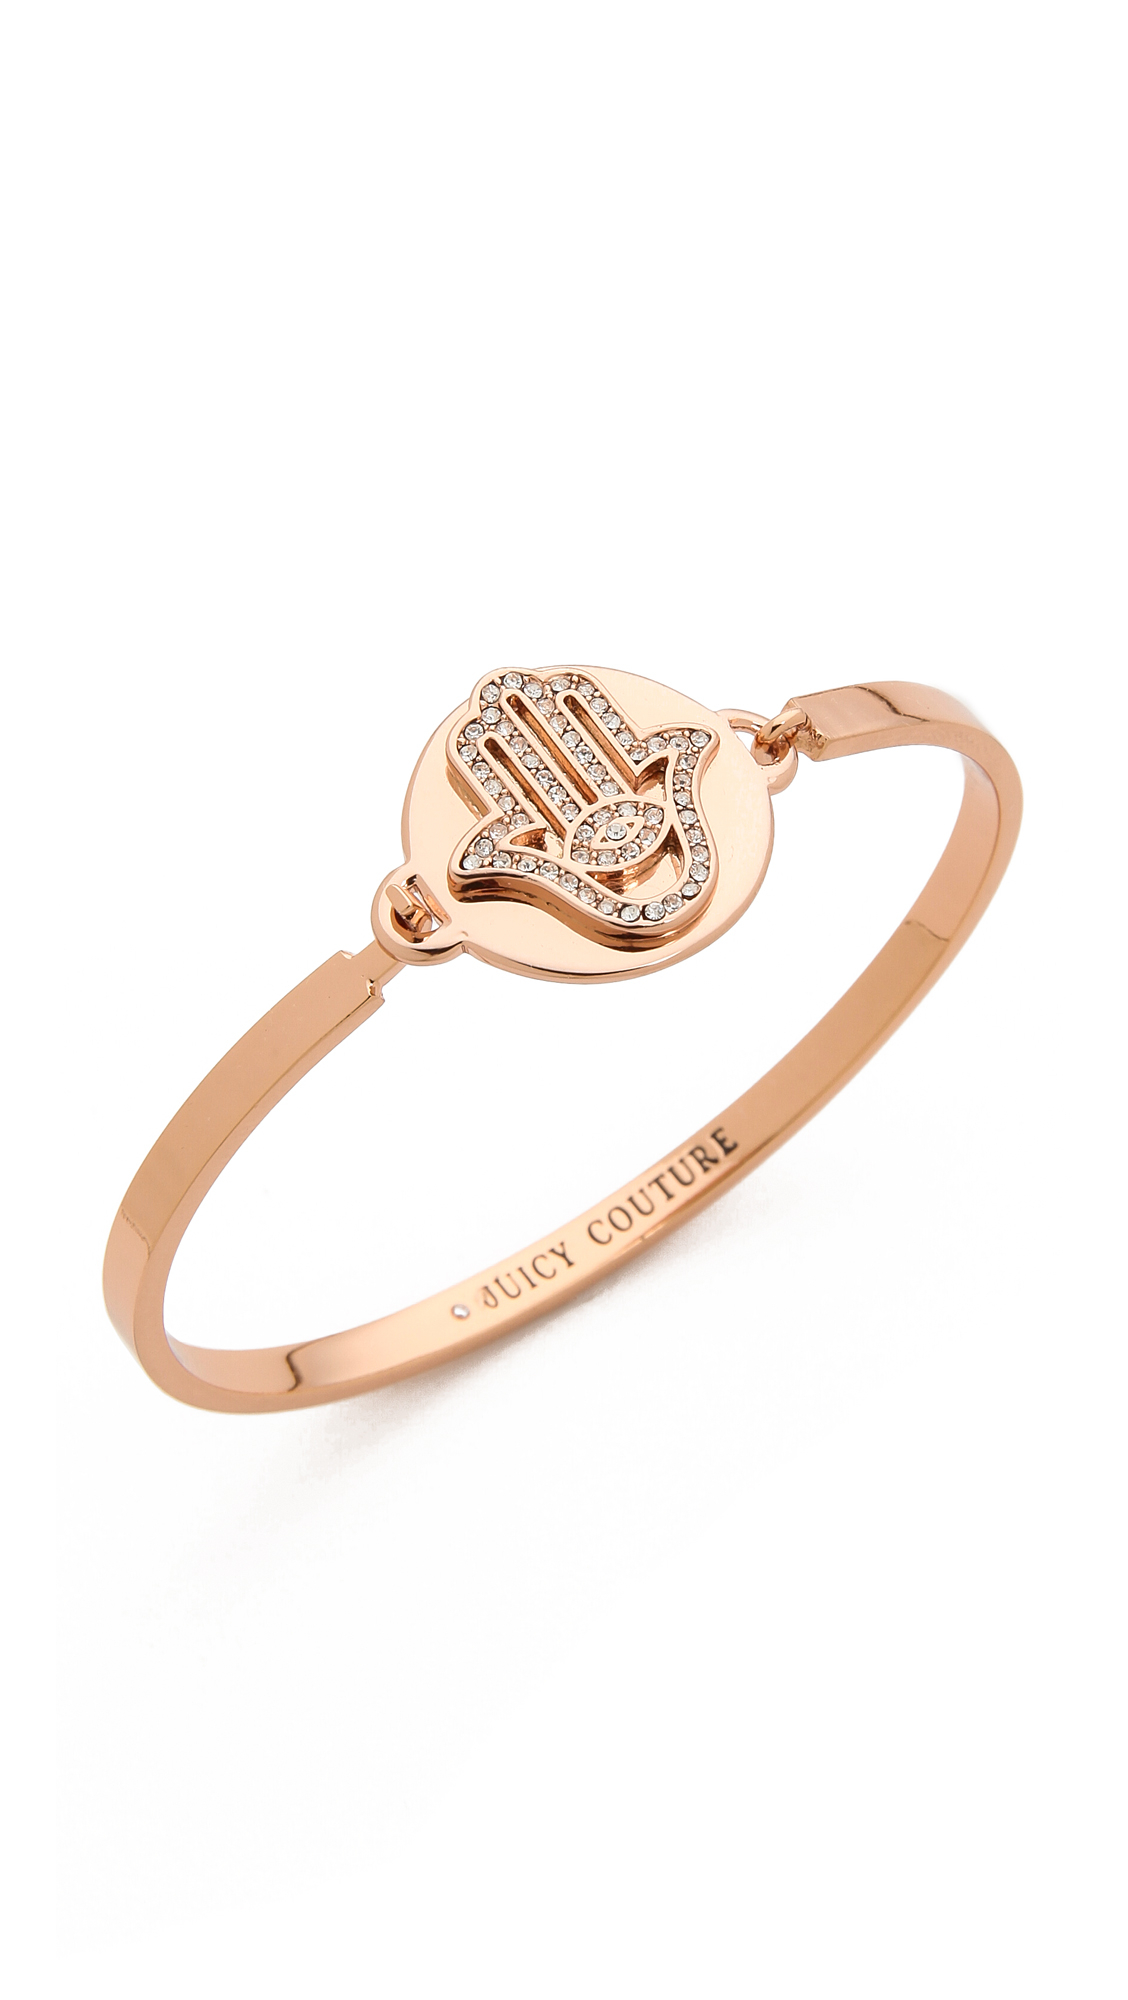 Lyst Juicy Couture Pave Hamsa Bangle Bracelet Rose Gold in Metallic